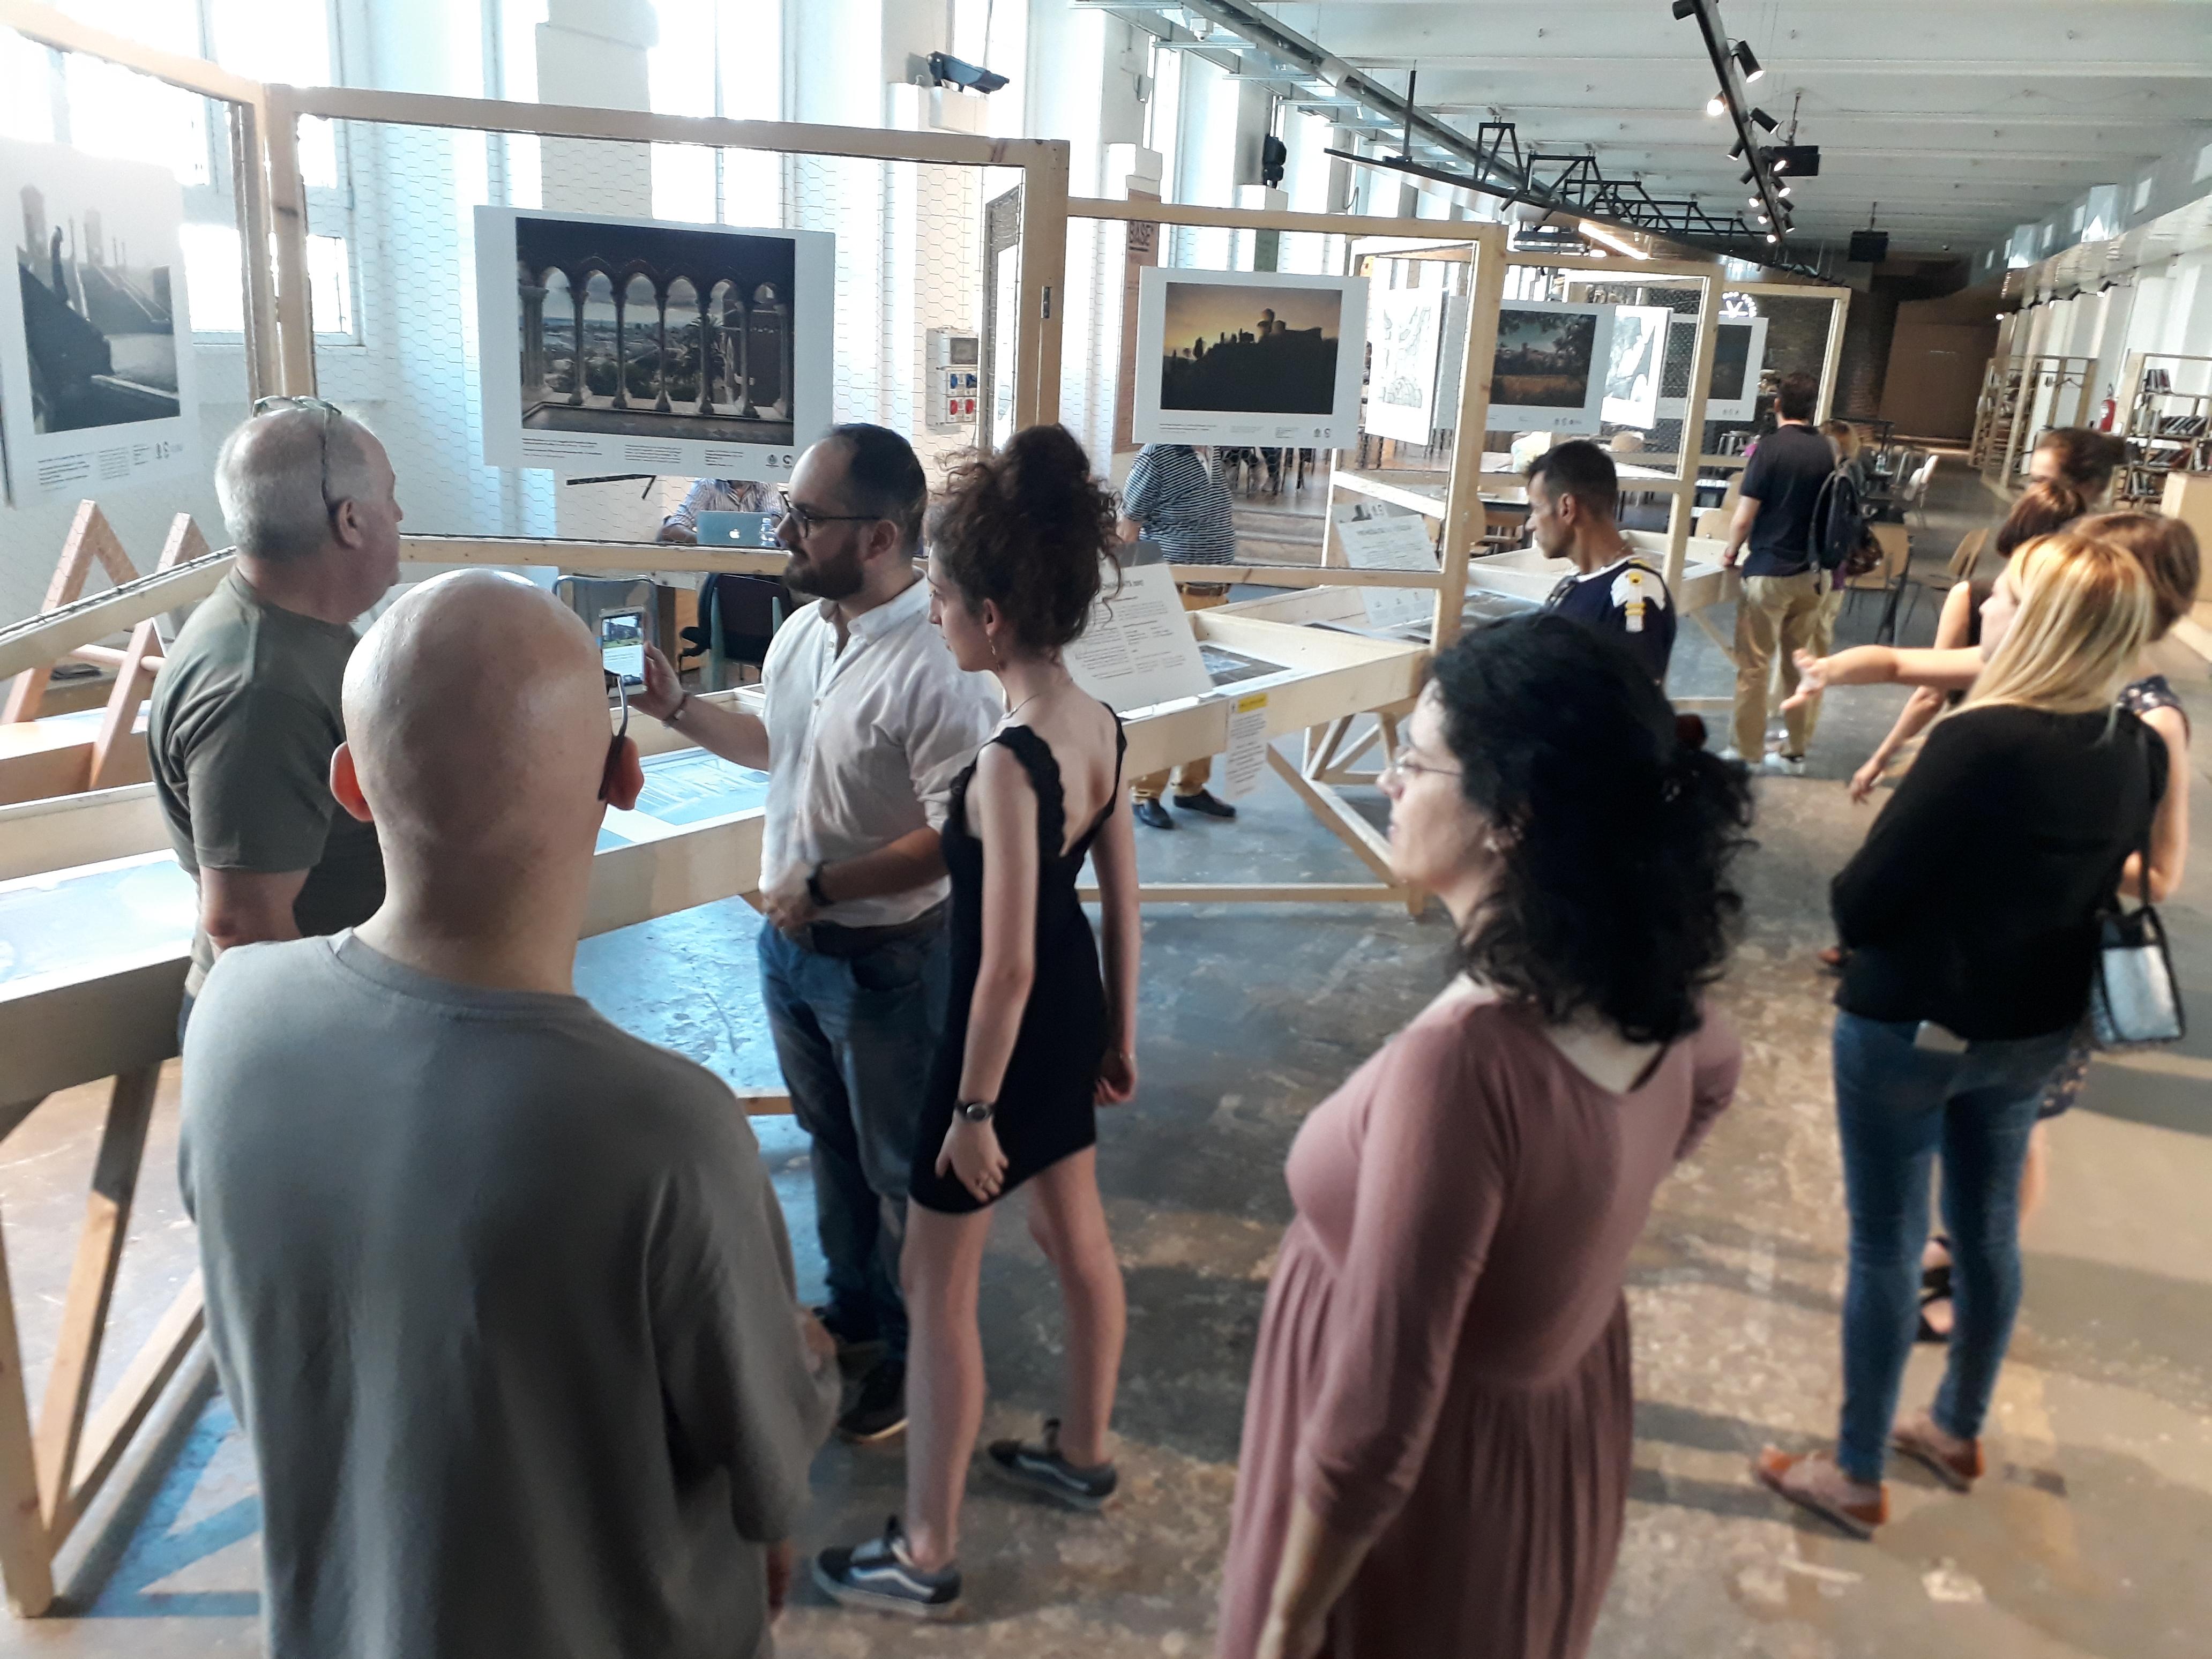 Mostra Design Milano 2018 file:mostra wiki loves monuments italia - base milano